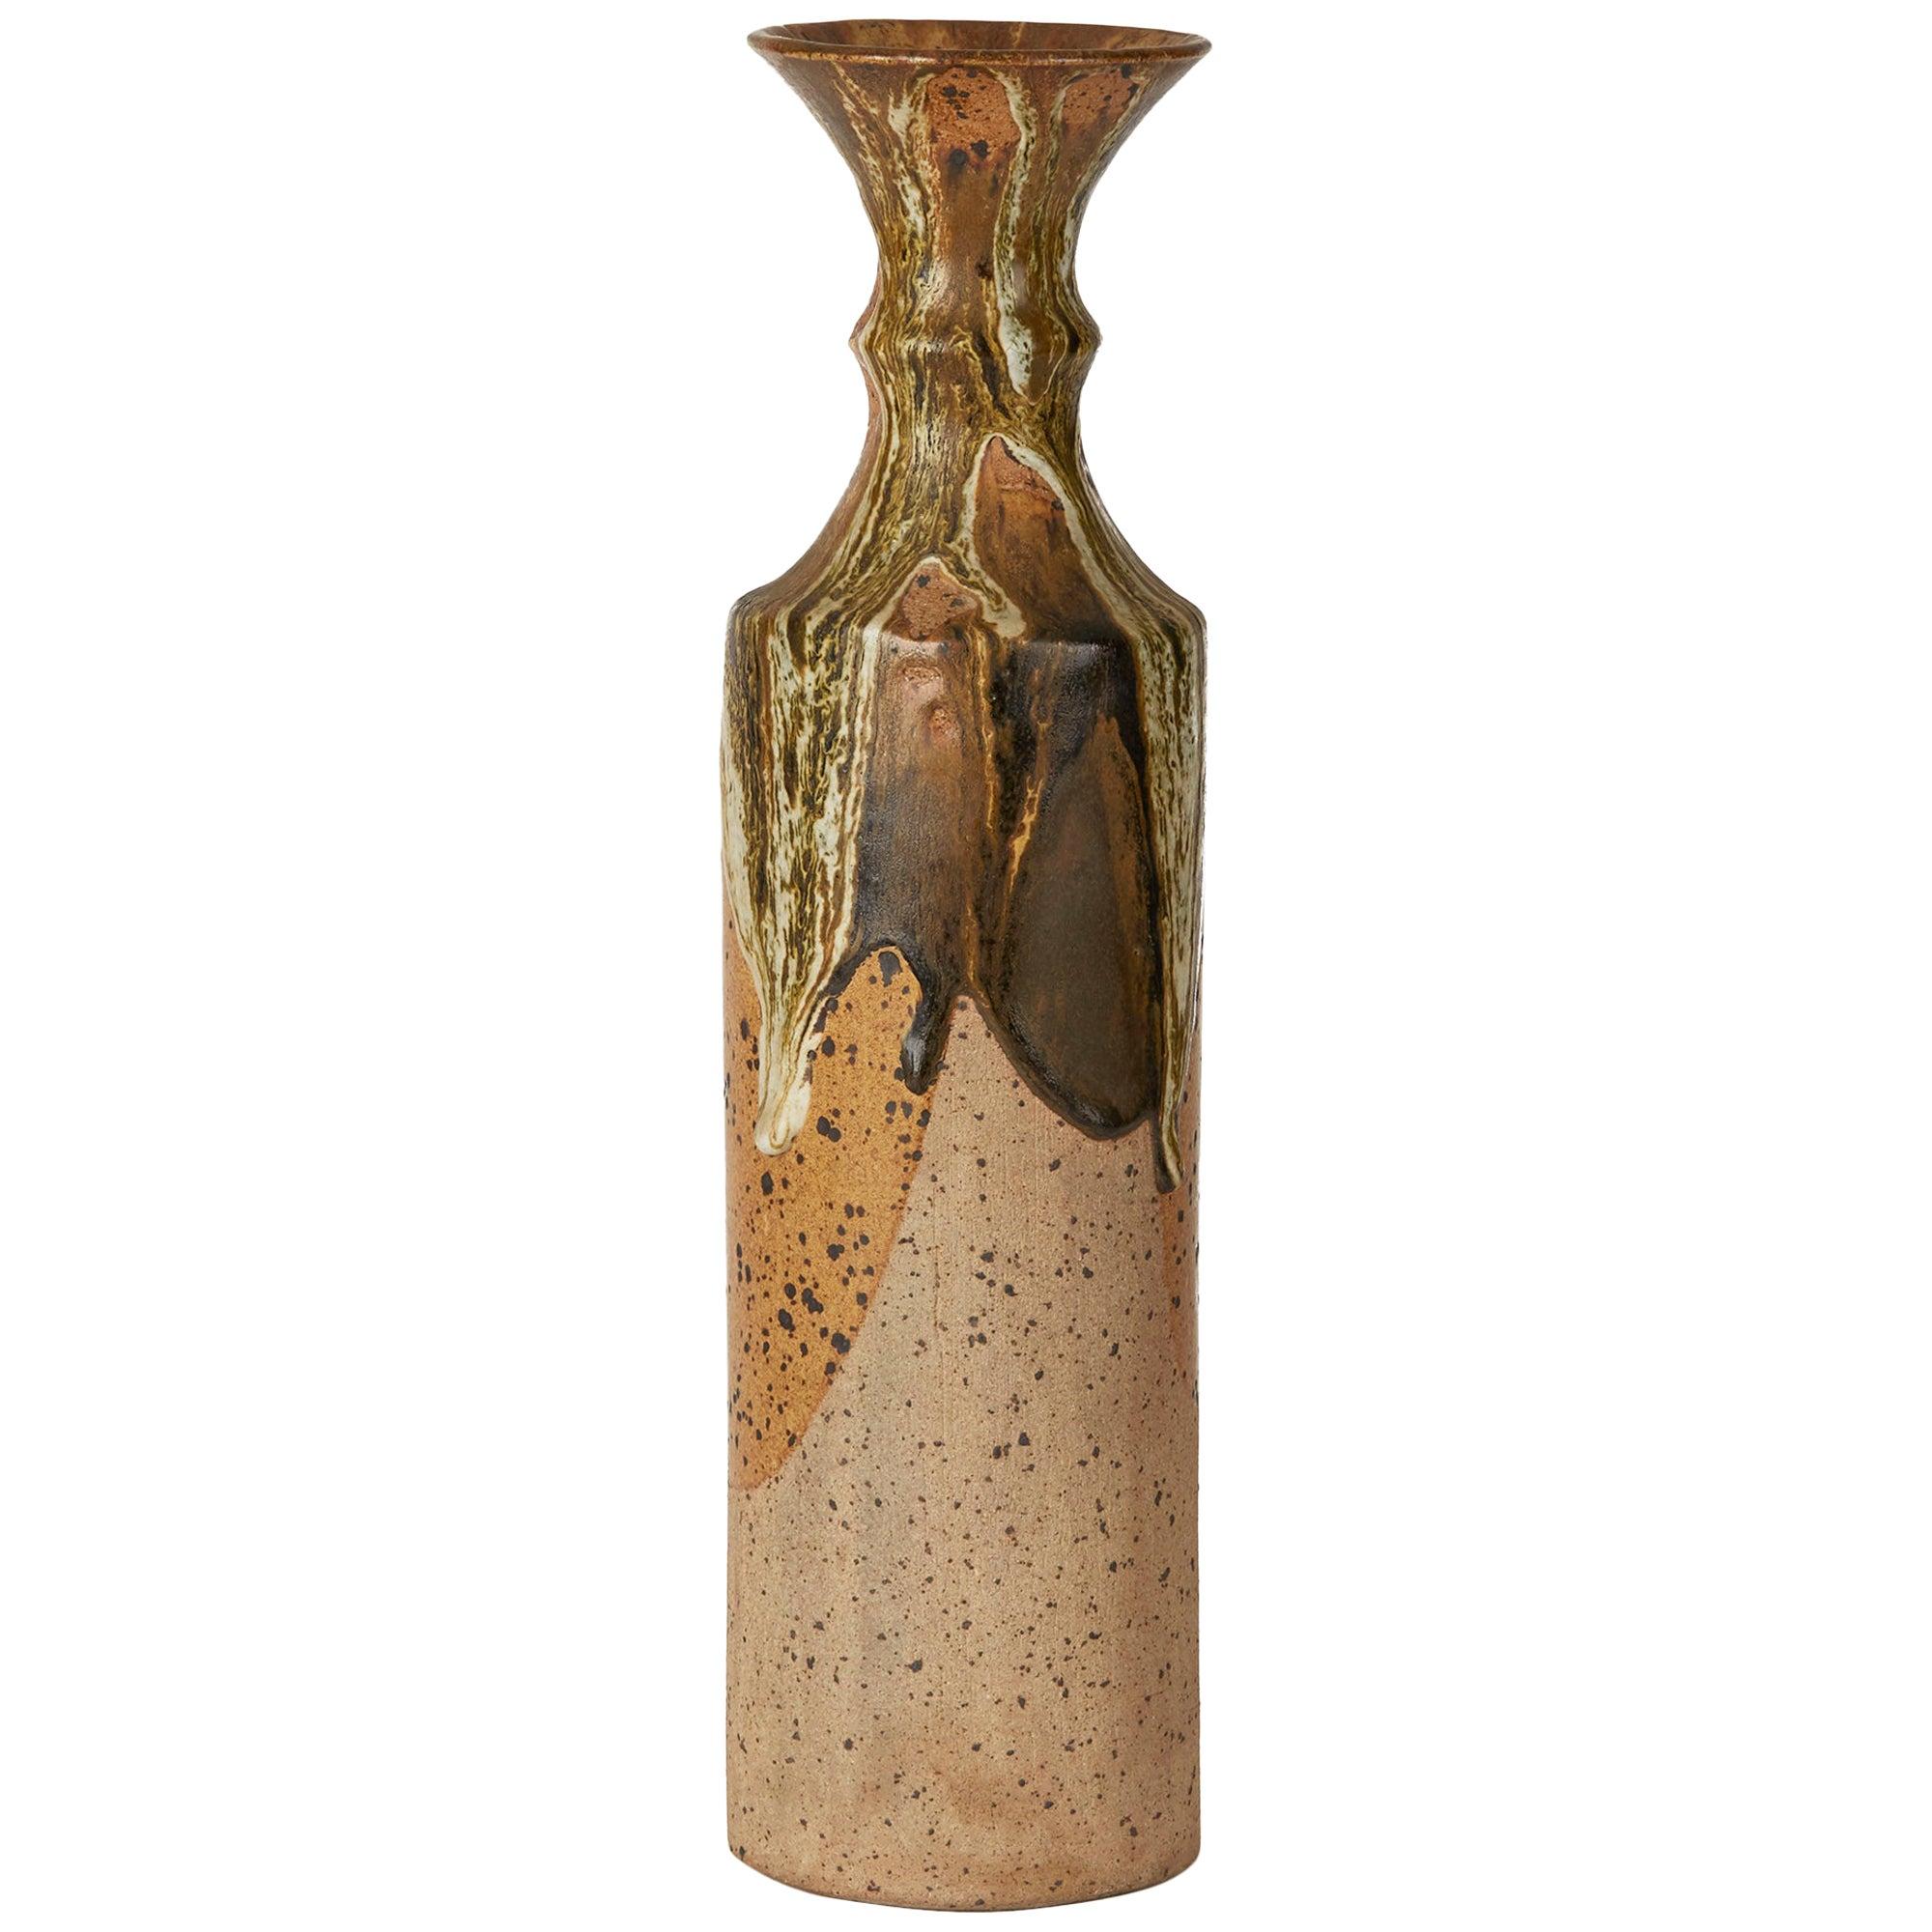 Vintage Studio Pottery Drip Glazed Bottle Vase Signed